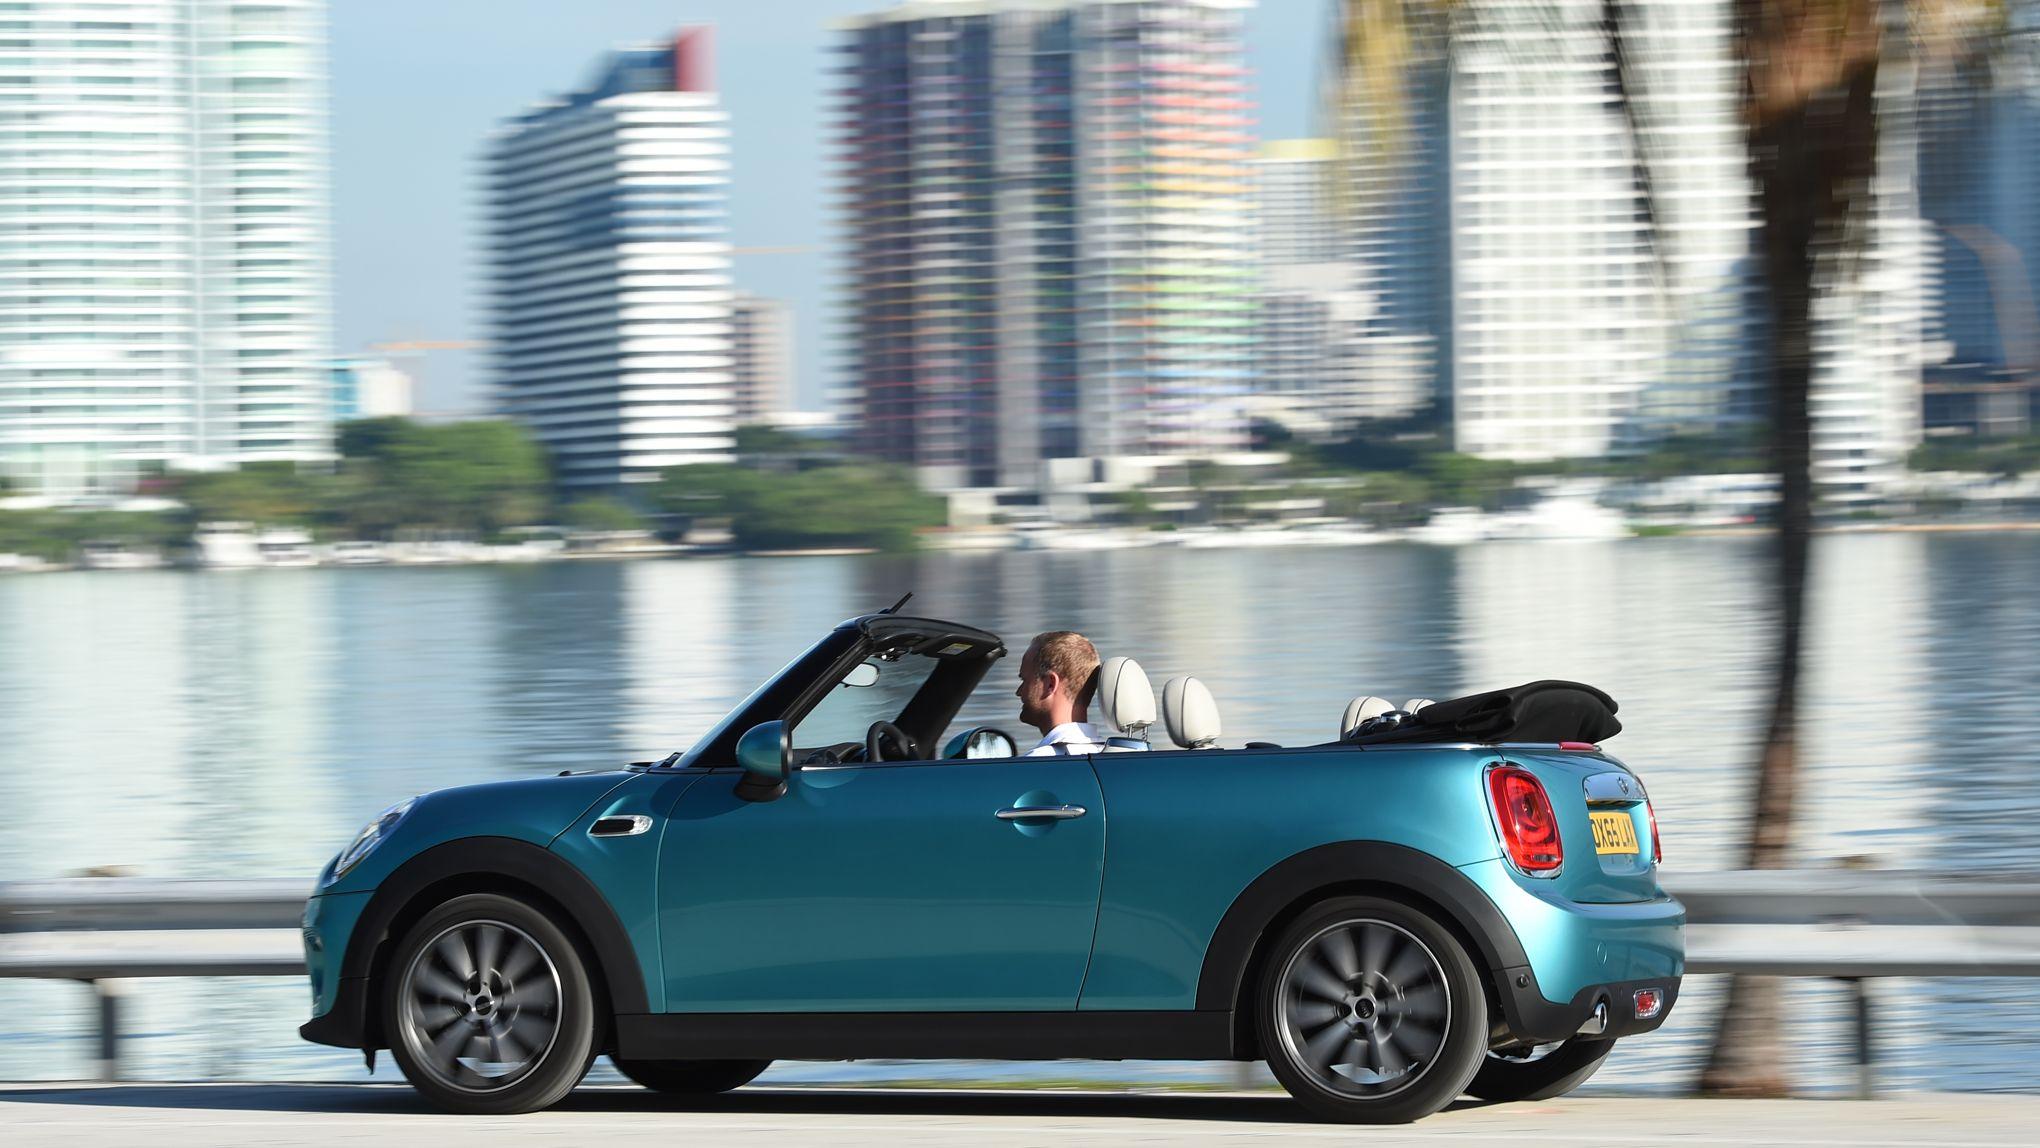 recherche roadster mini cabriolet